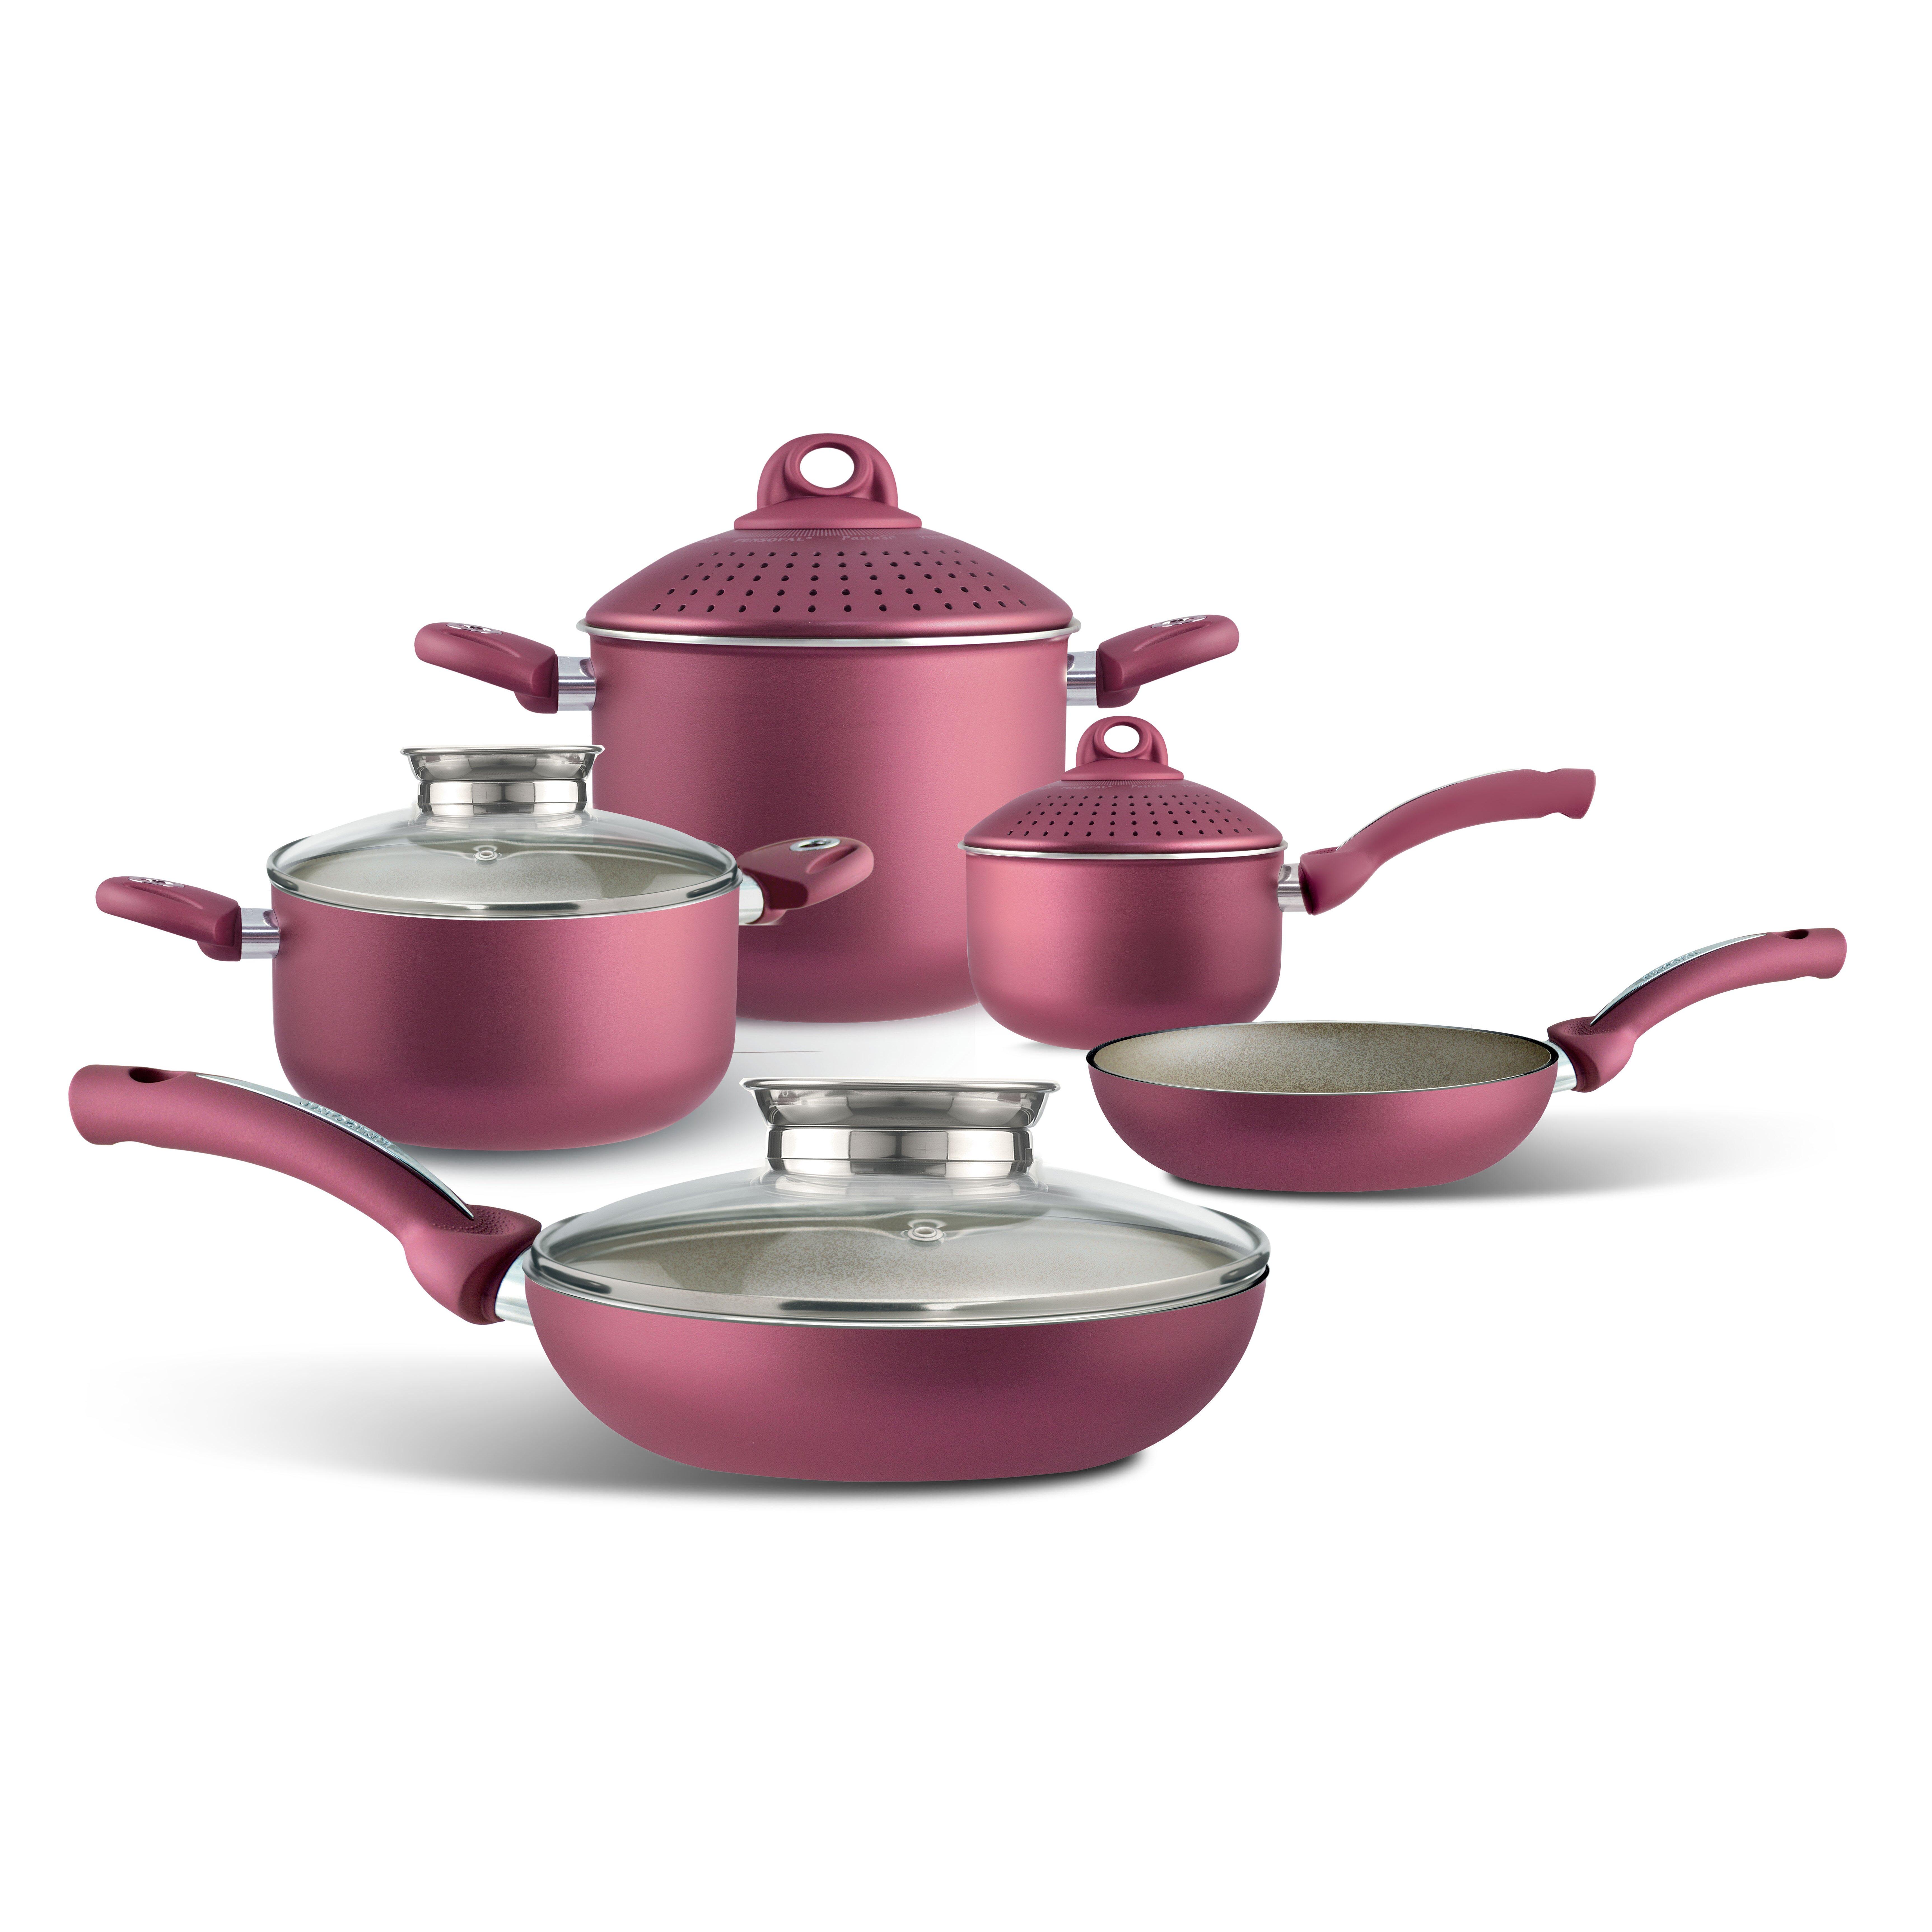 Pensofal Uniqum Rubino 5 Piece Cookware Set Reviews